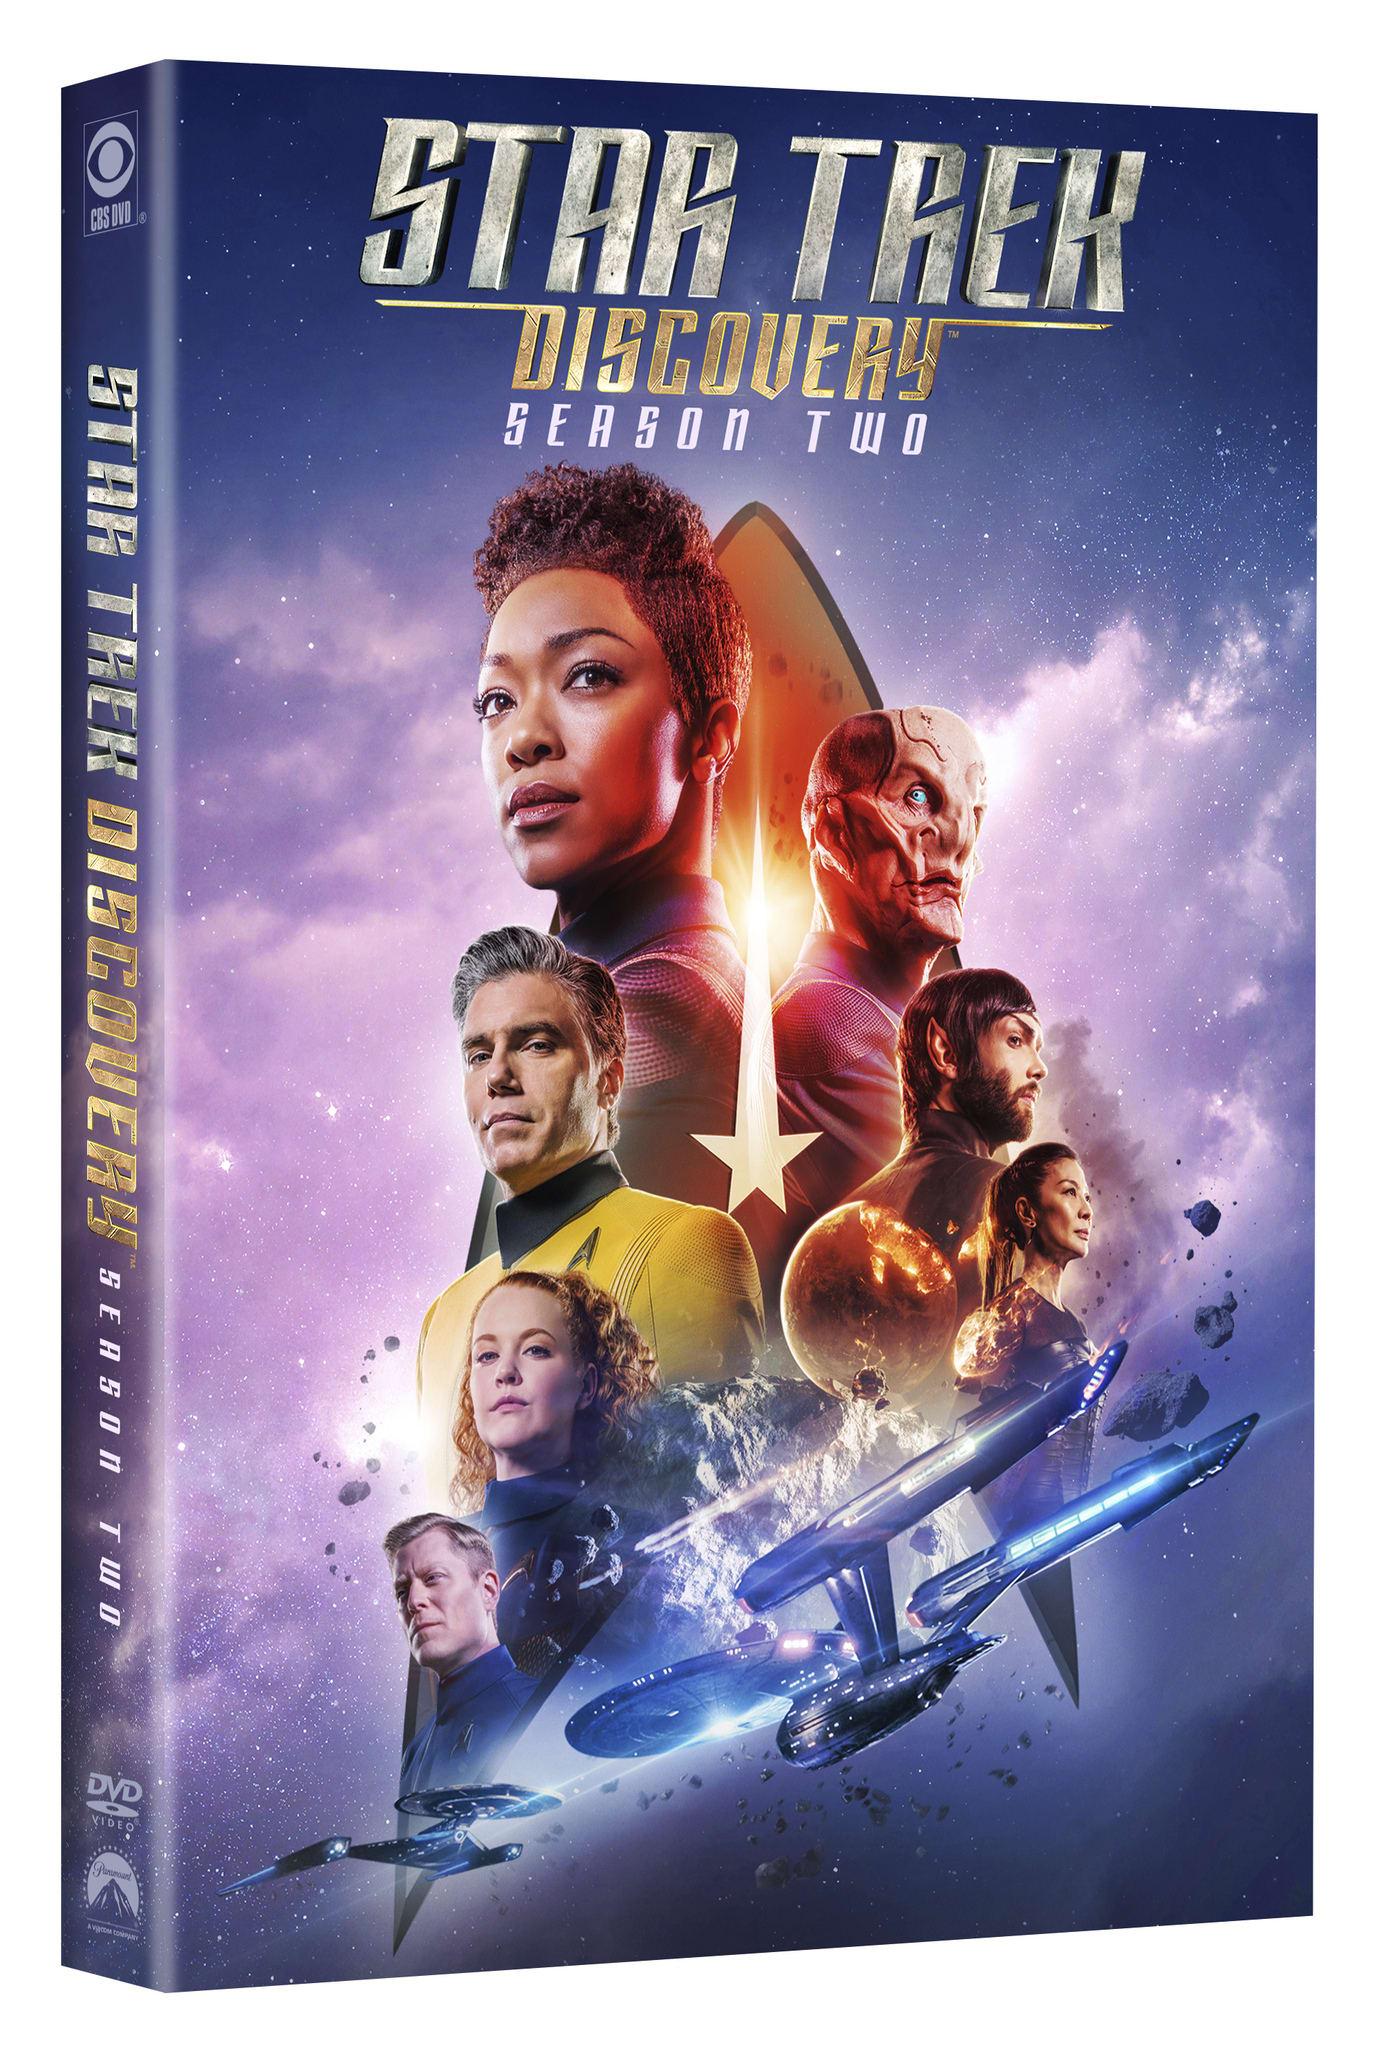 Star Trek: Discovery Season 2 Blu-ray